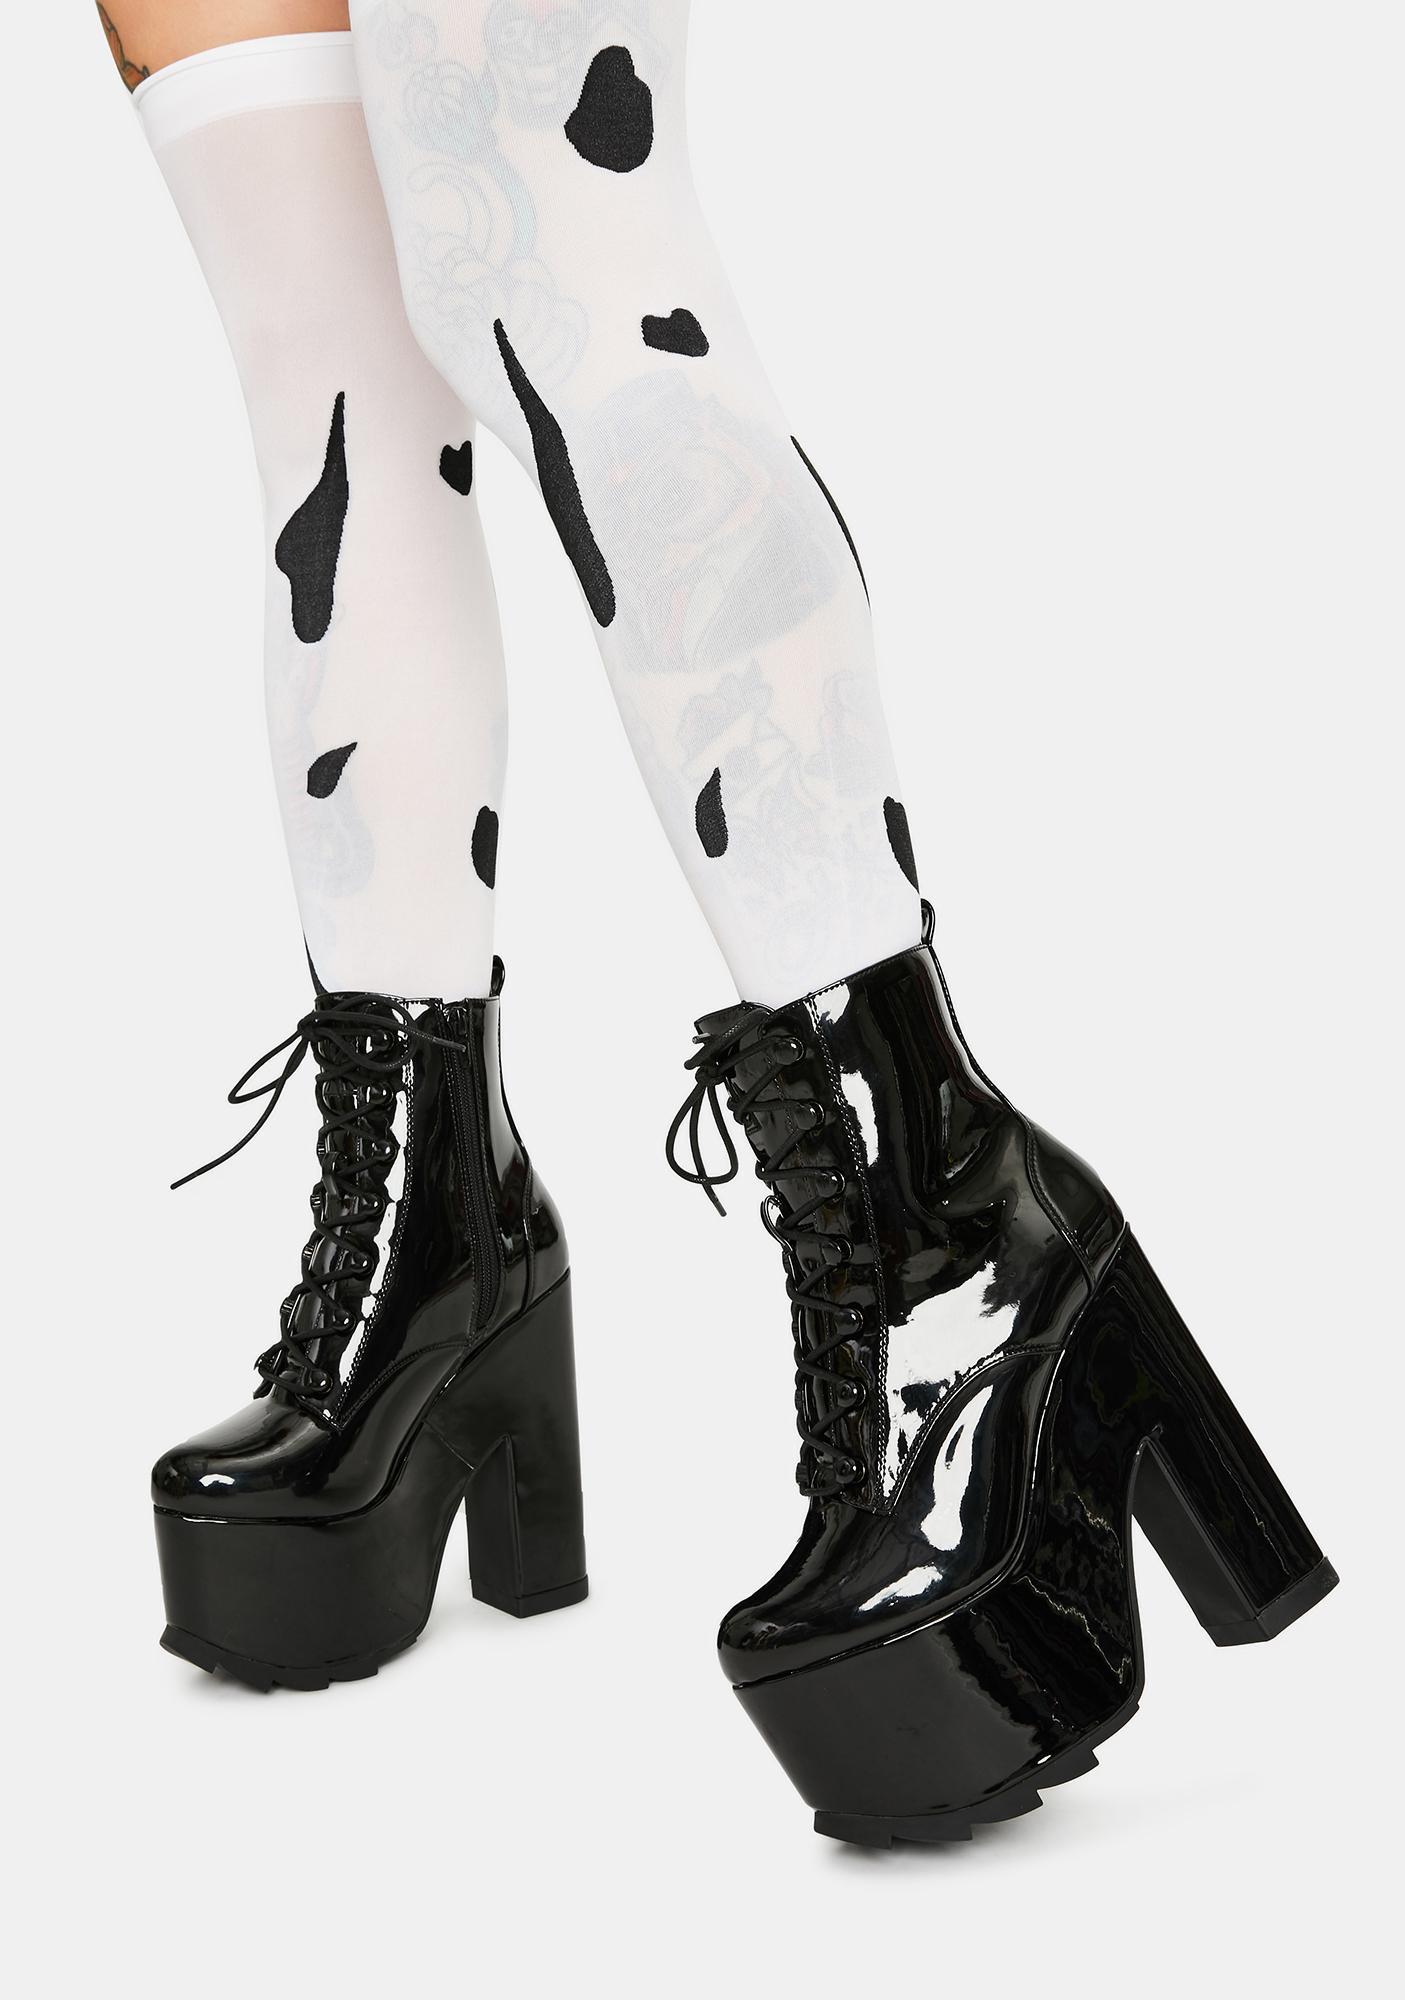 Y.R.U. Night Terror Black Patent Platform Boots